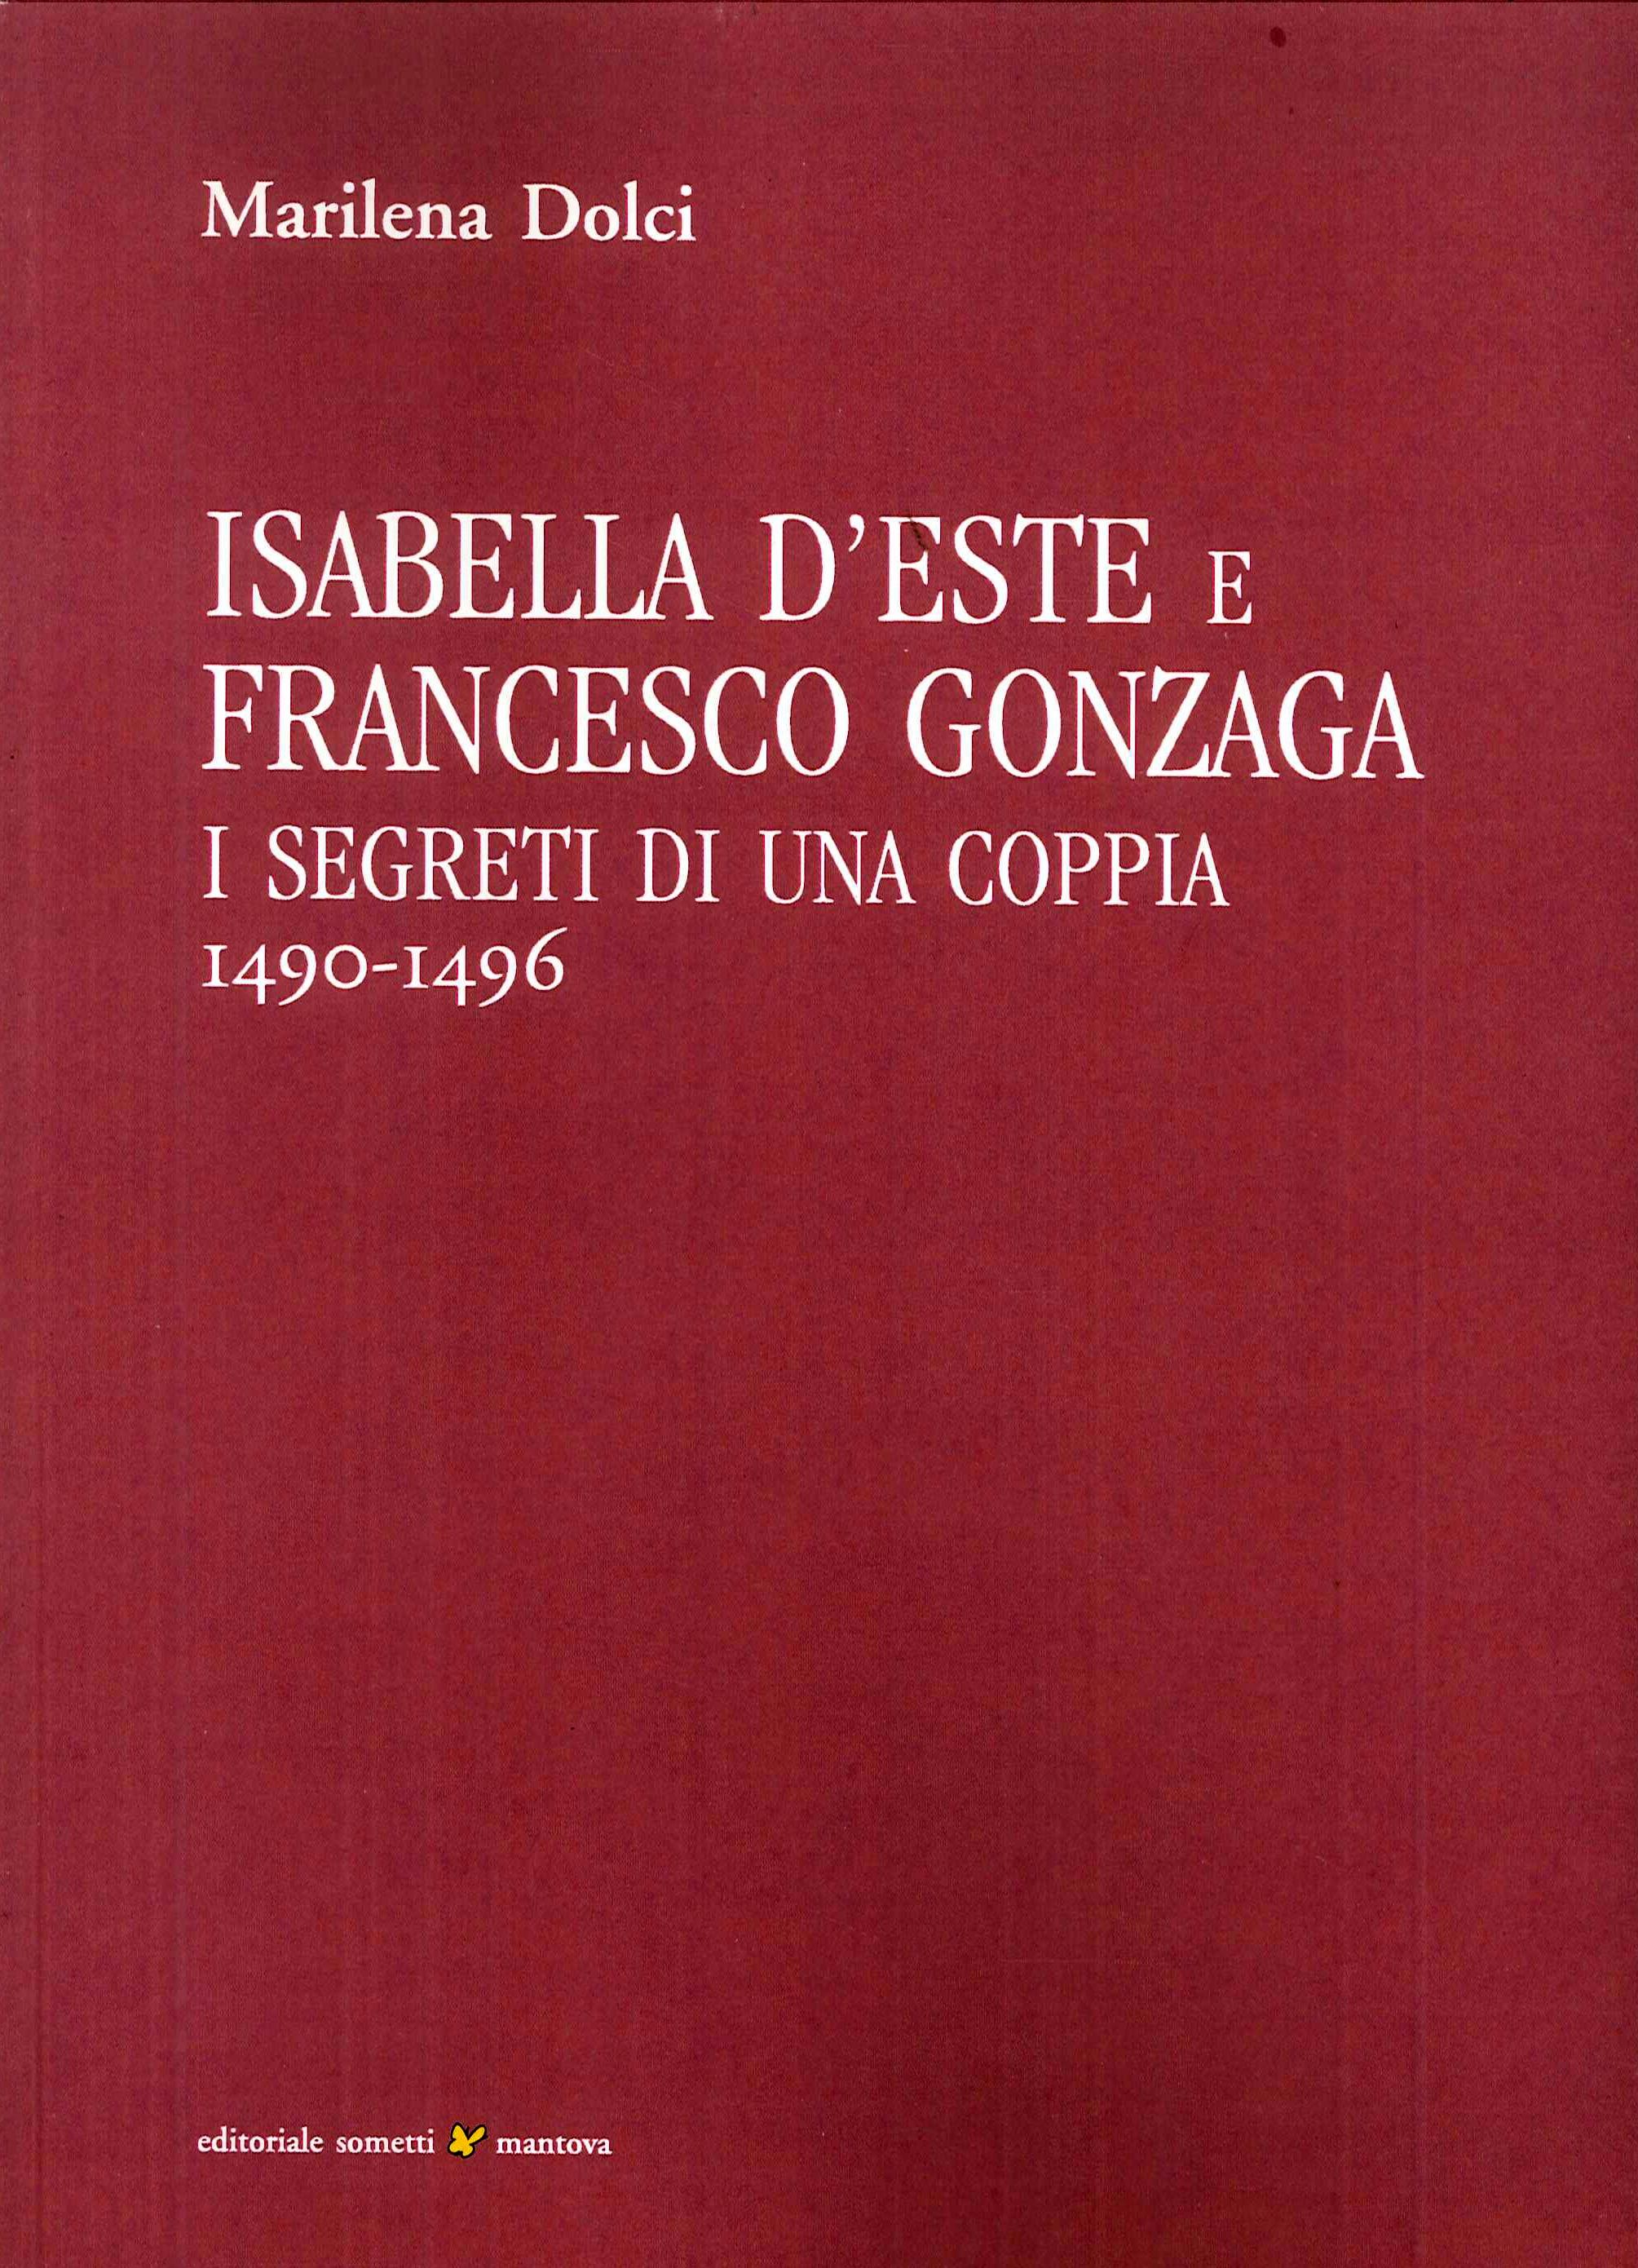 Isabella d'Este e Francesco Gonzaga. I segreti di una coppia 1490-1496